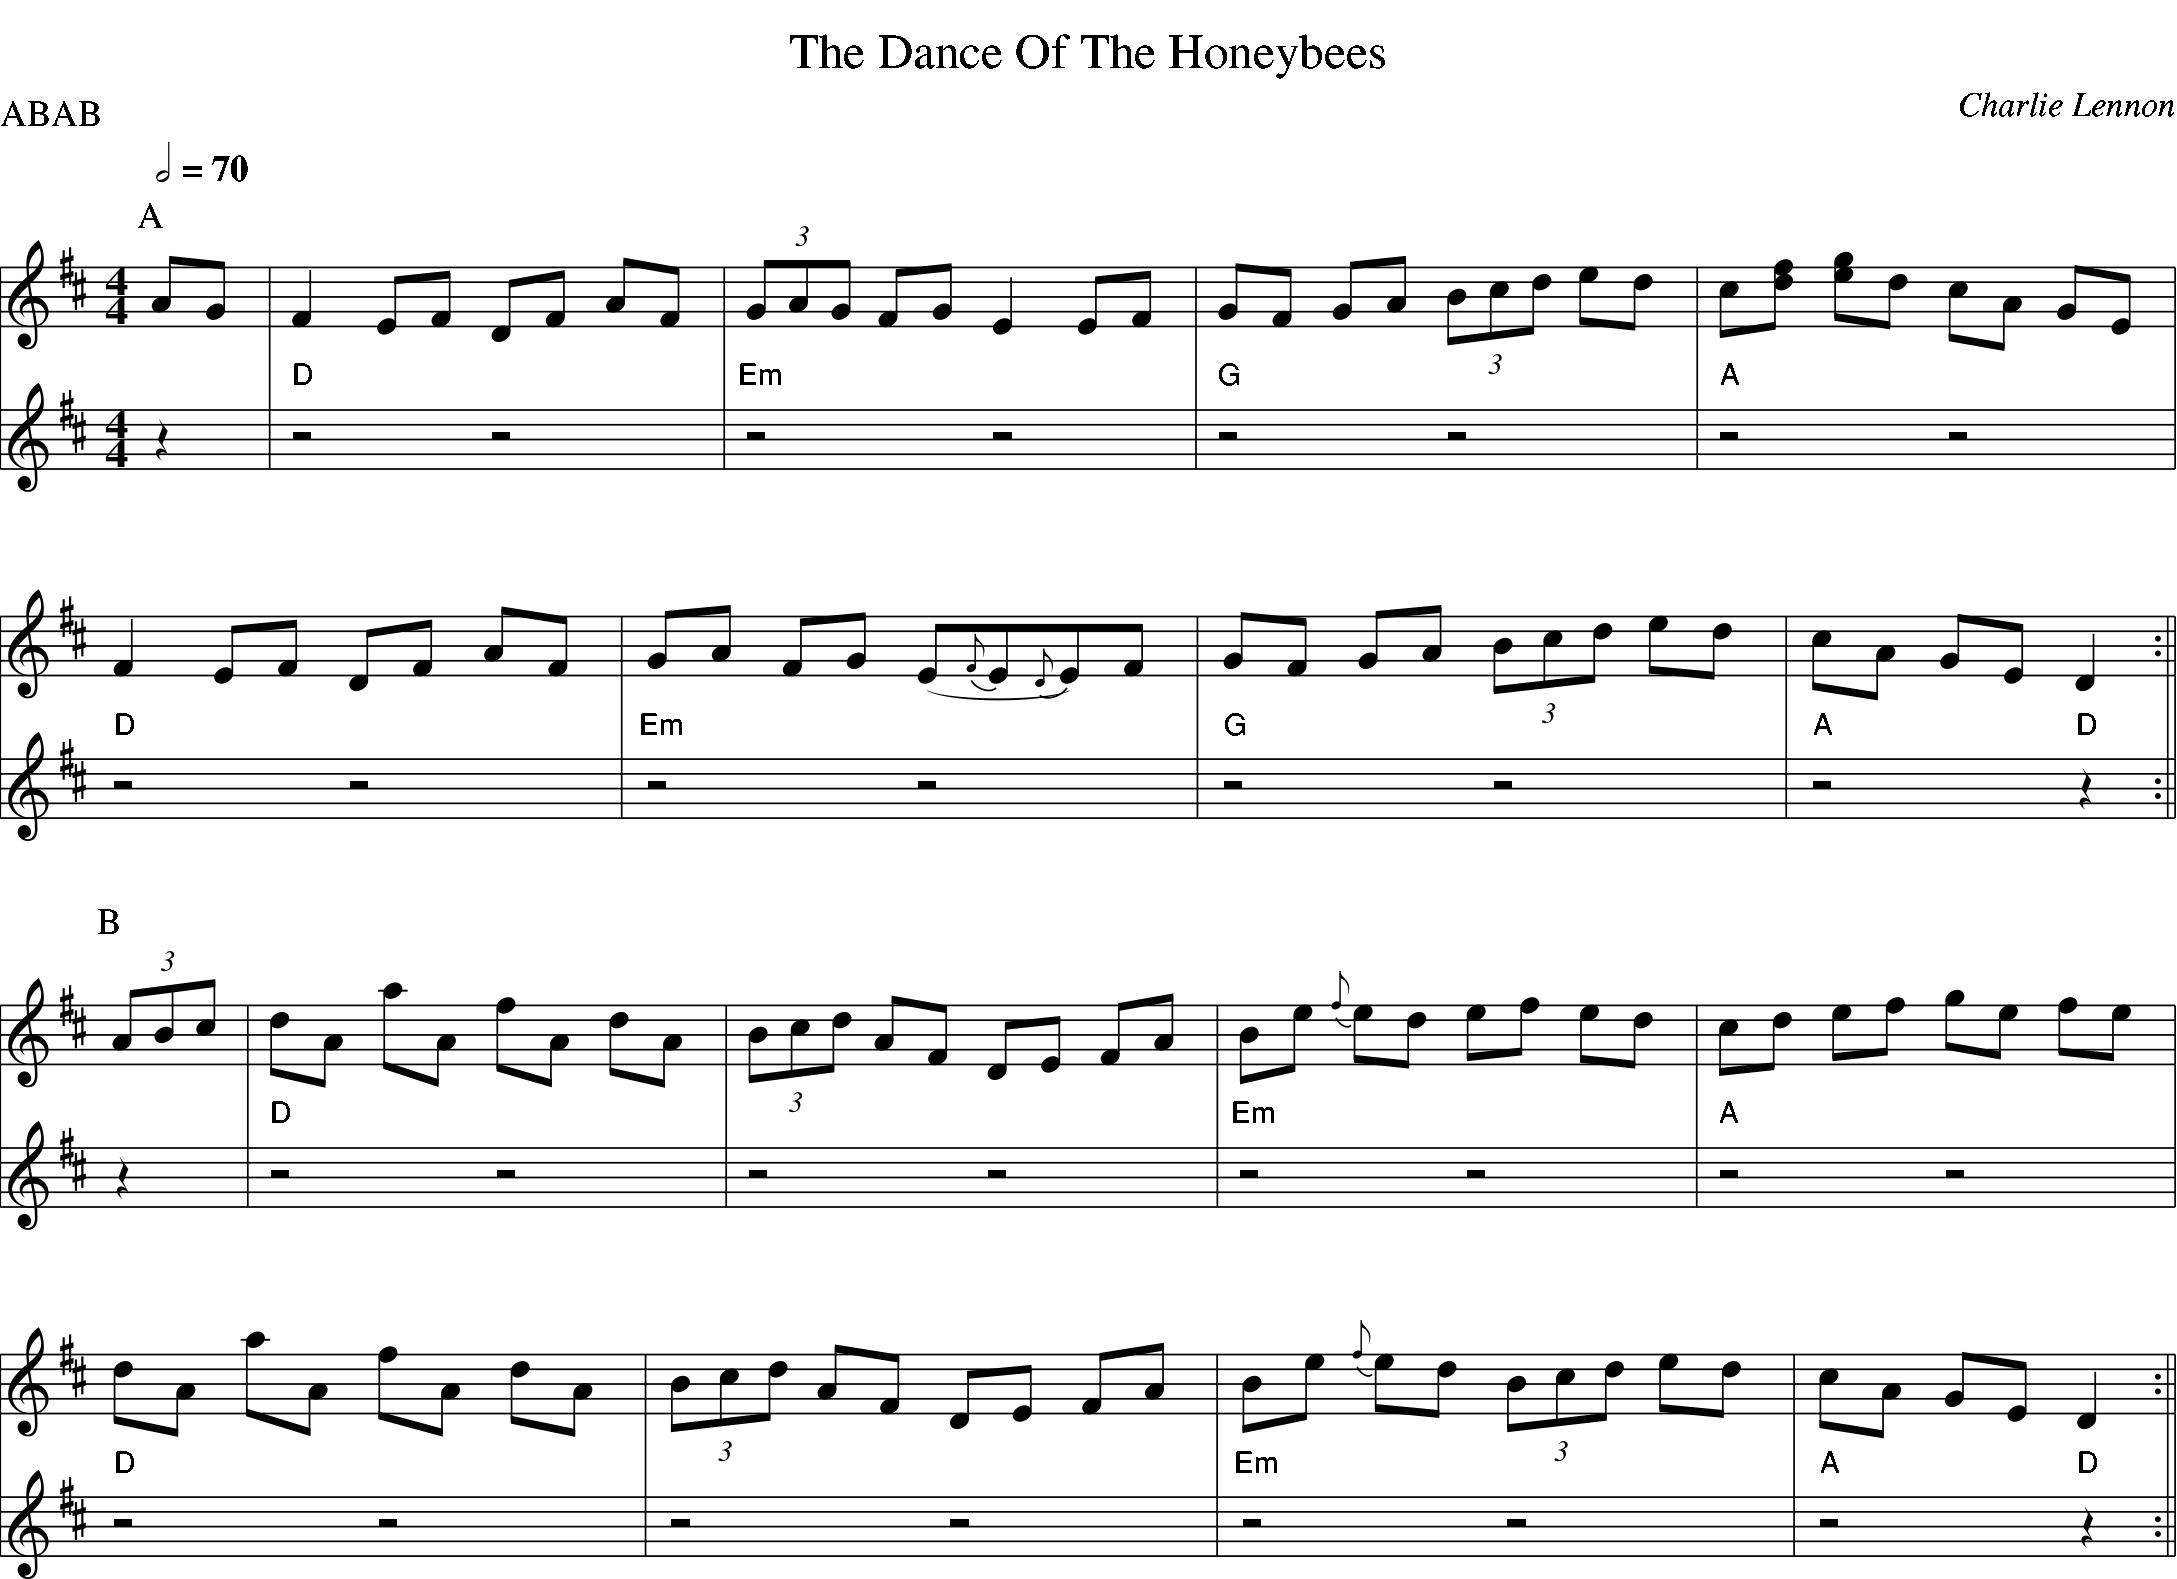 The Dance of the Honeybees